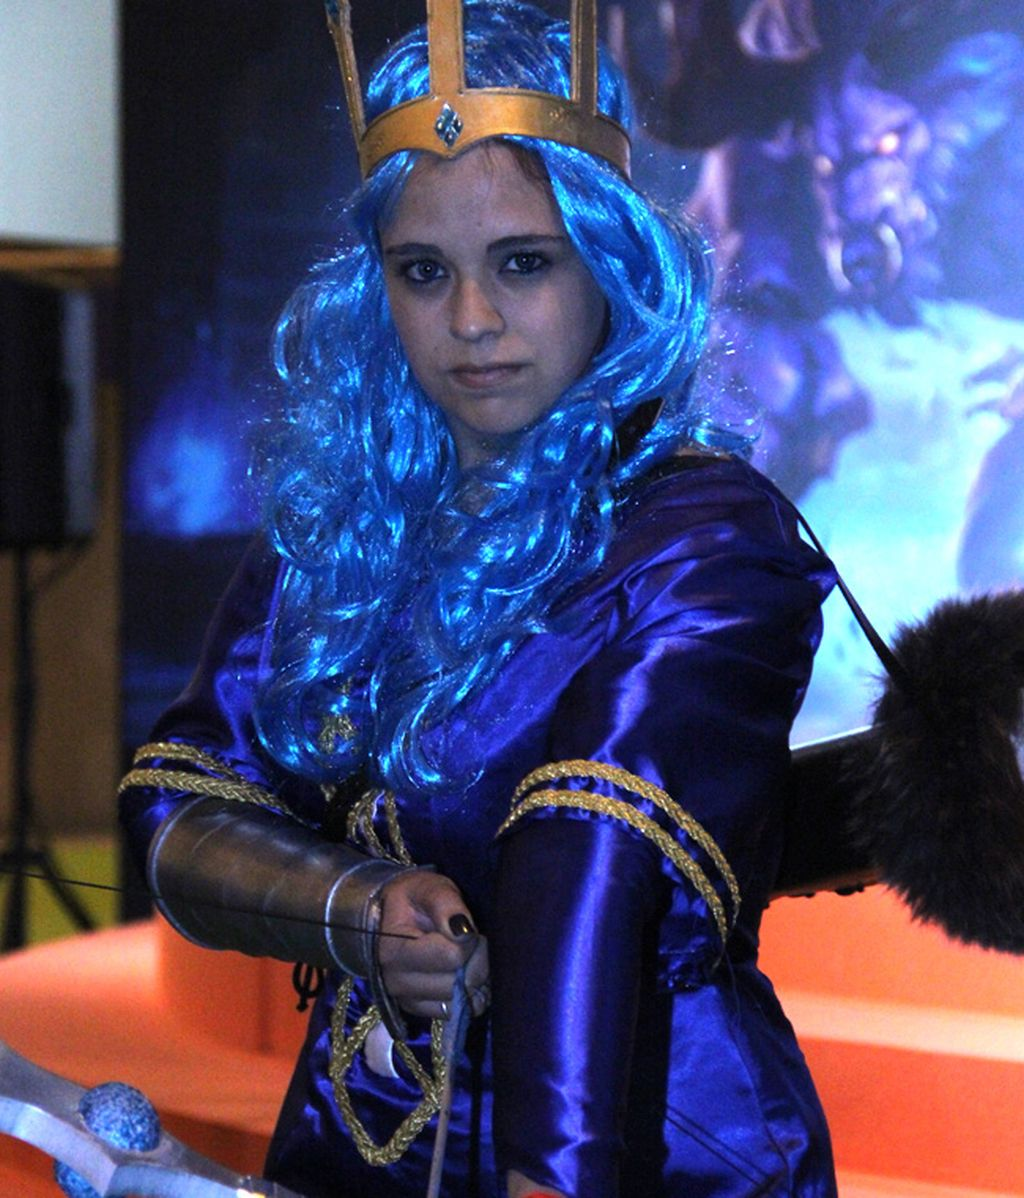 'Ashe Reina' preparando su arco en Gamergy